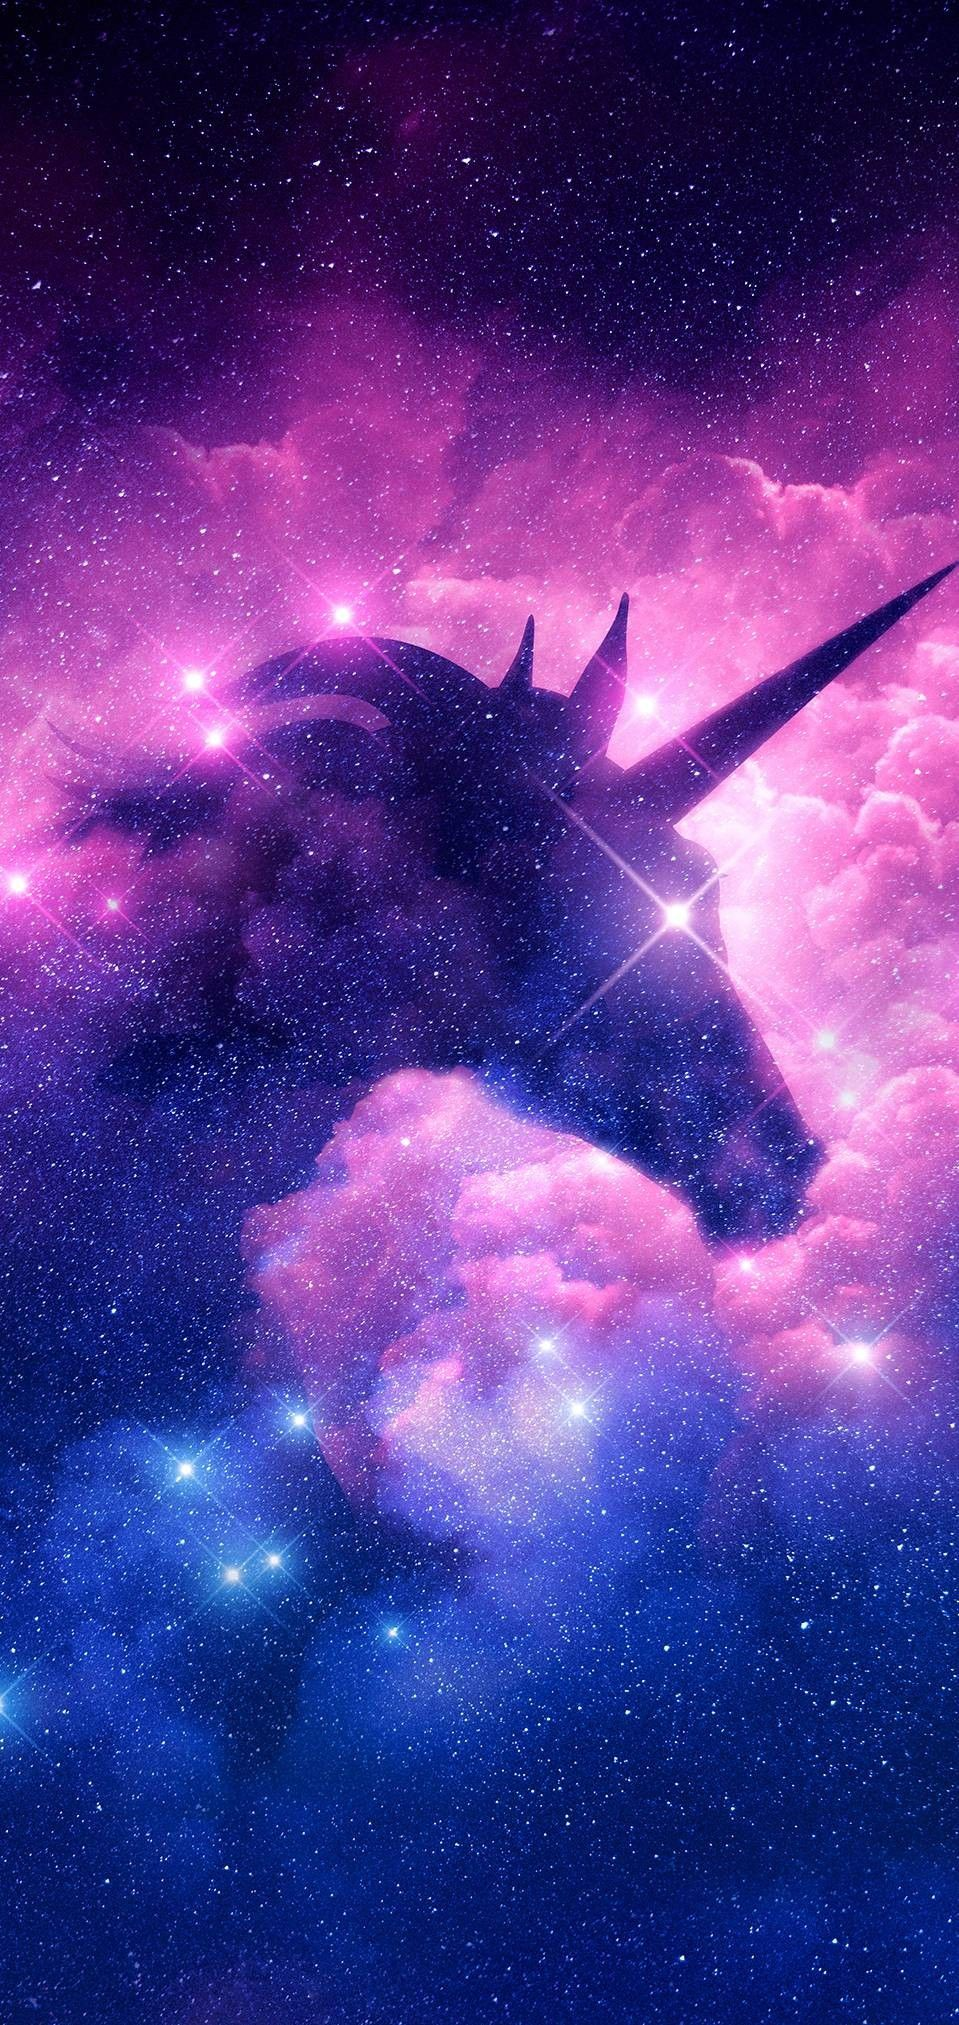 Flying Space Galaxy Unicorn Poster Unicorn Poster Unicorn Pictures Unicorn Wallpaper